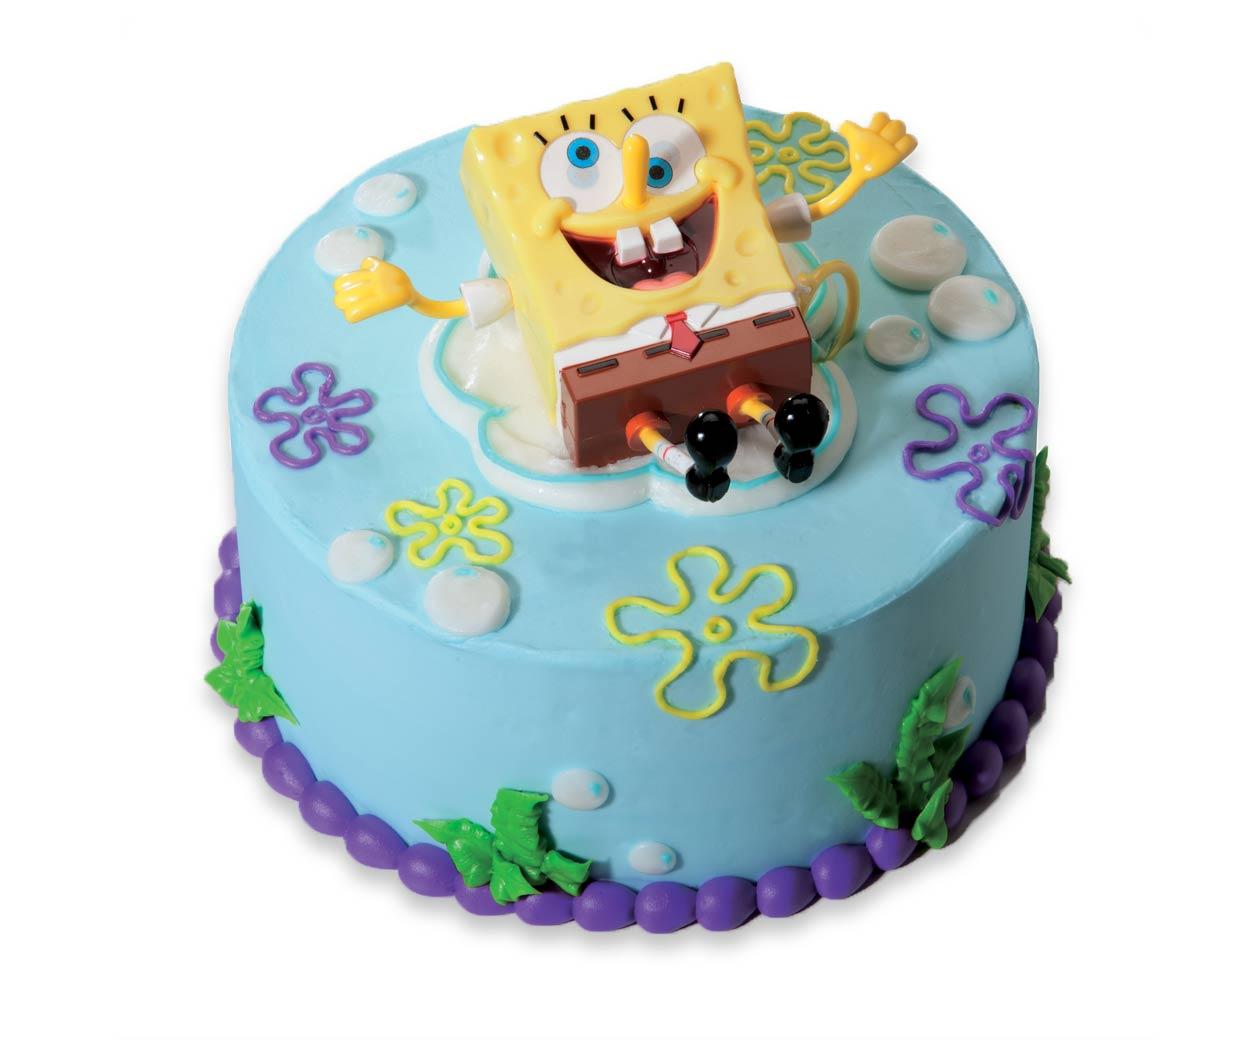 Cold Stone Creamery Birthday Cake Designs